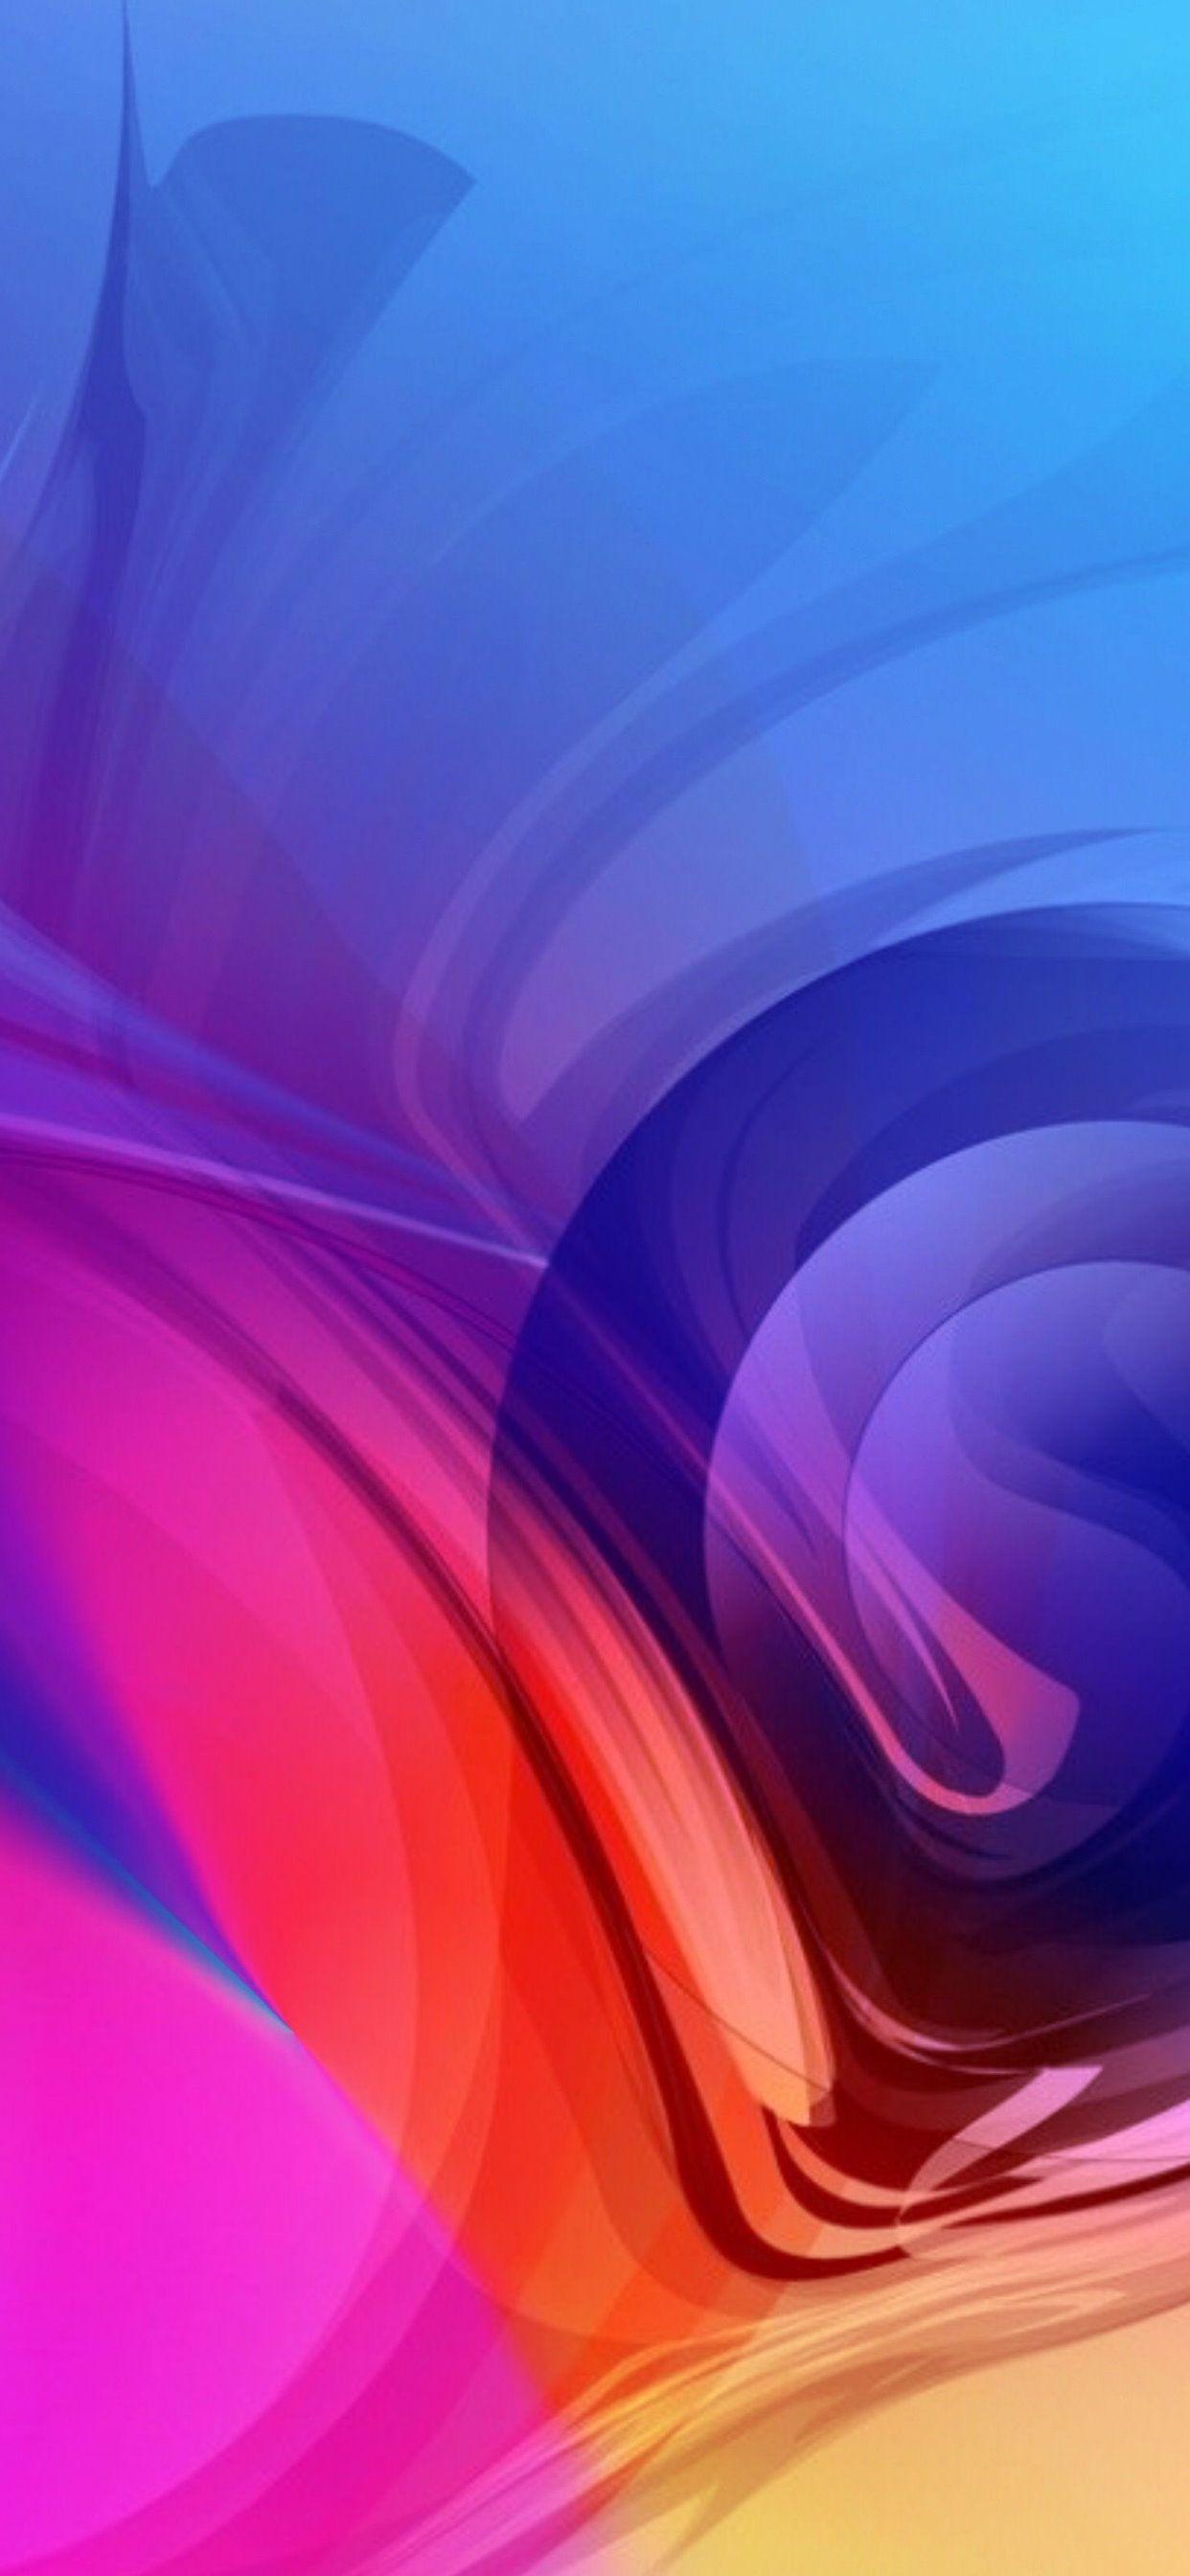 Wallpapers Apple Iphone Xs Max Fond Ecran Iphone Fond D Ecran Neon Idees De Papier Peint